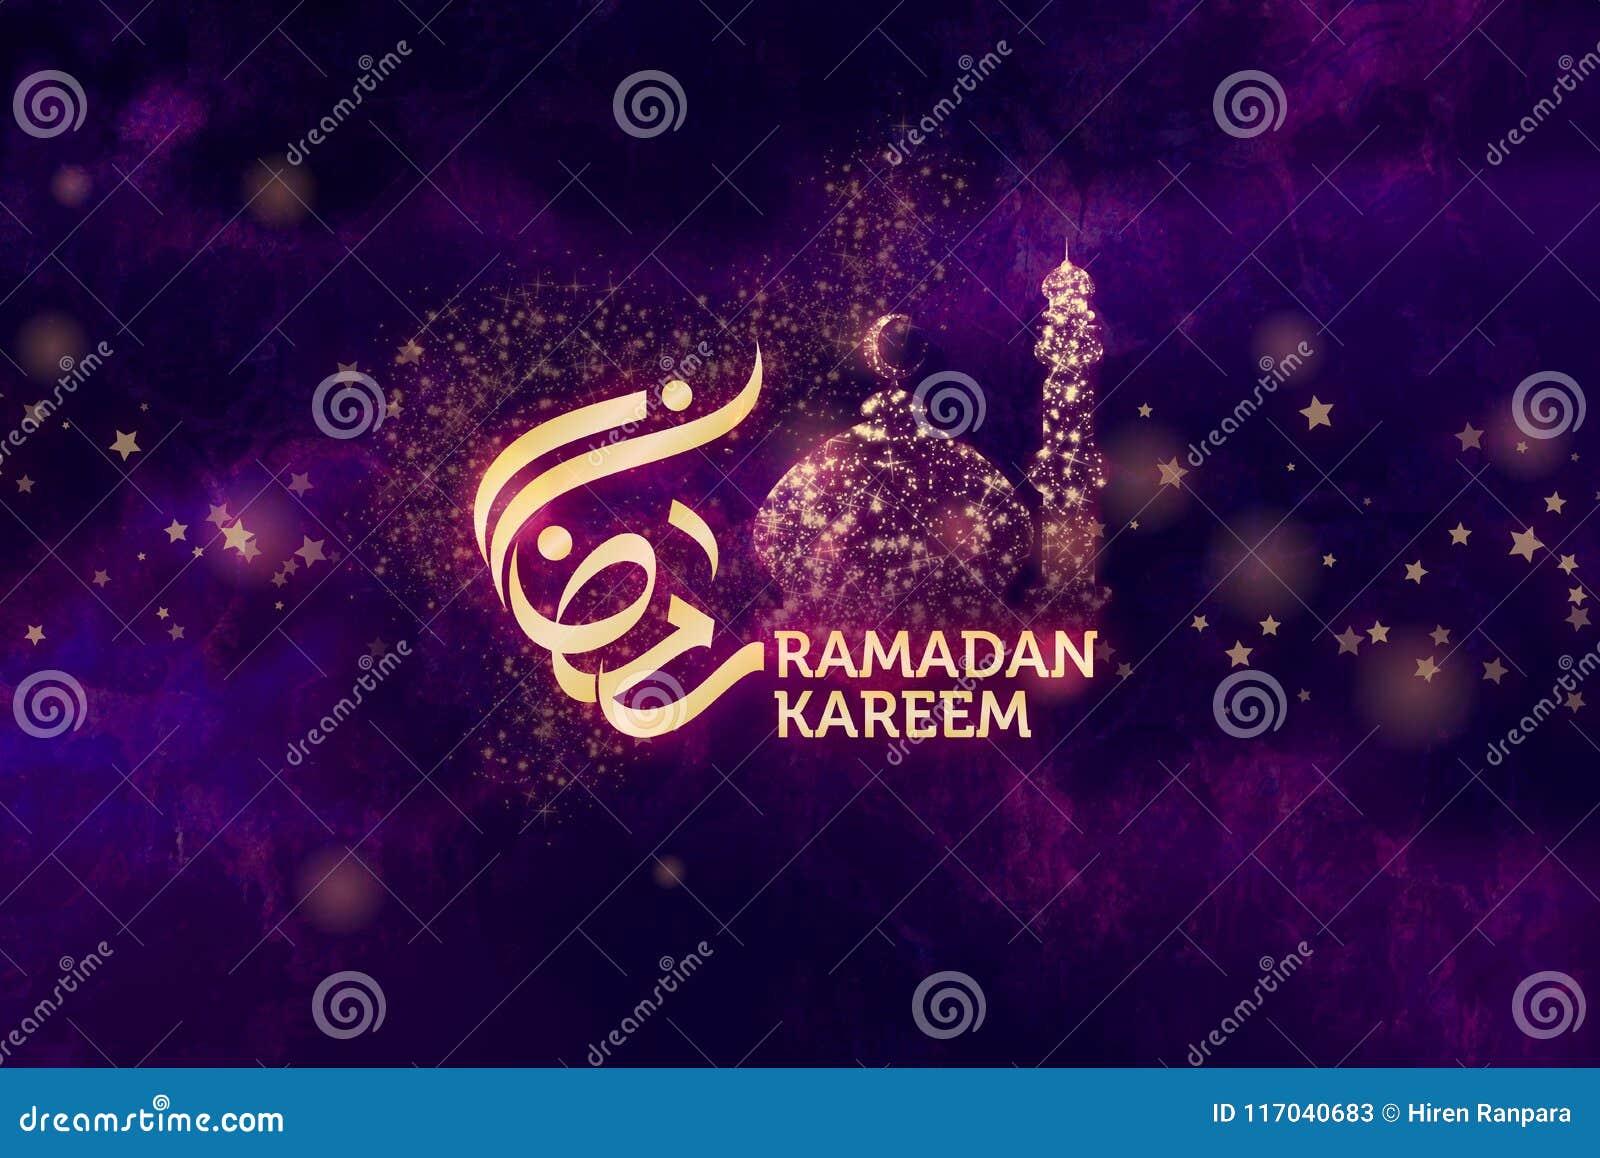 Ramadan Kareem Greetings med arabisk kalligrafi som betyder Ramadan